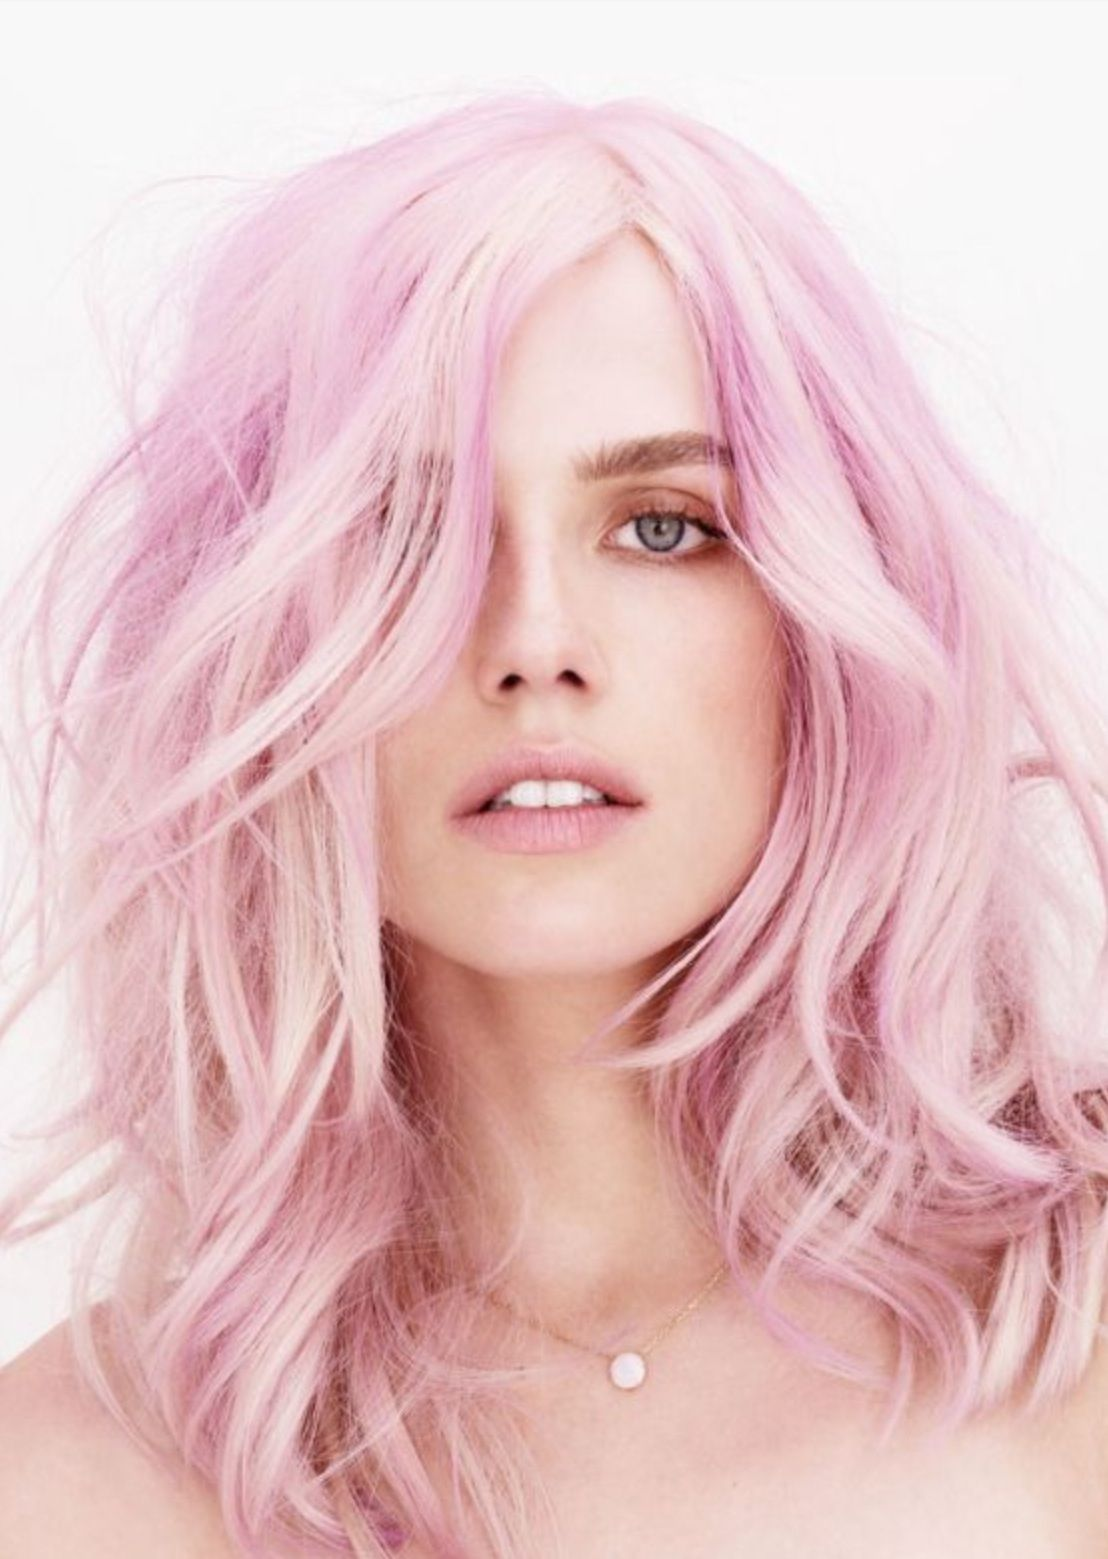 Fairy Floss Haarfarben Pinke Haare Haar Styling